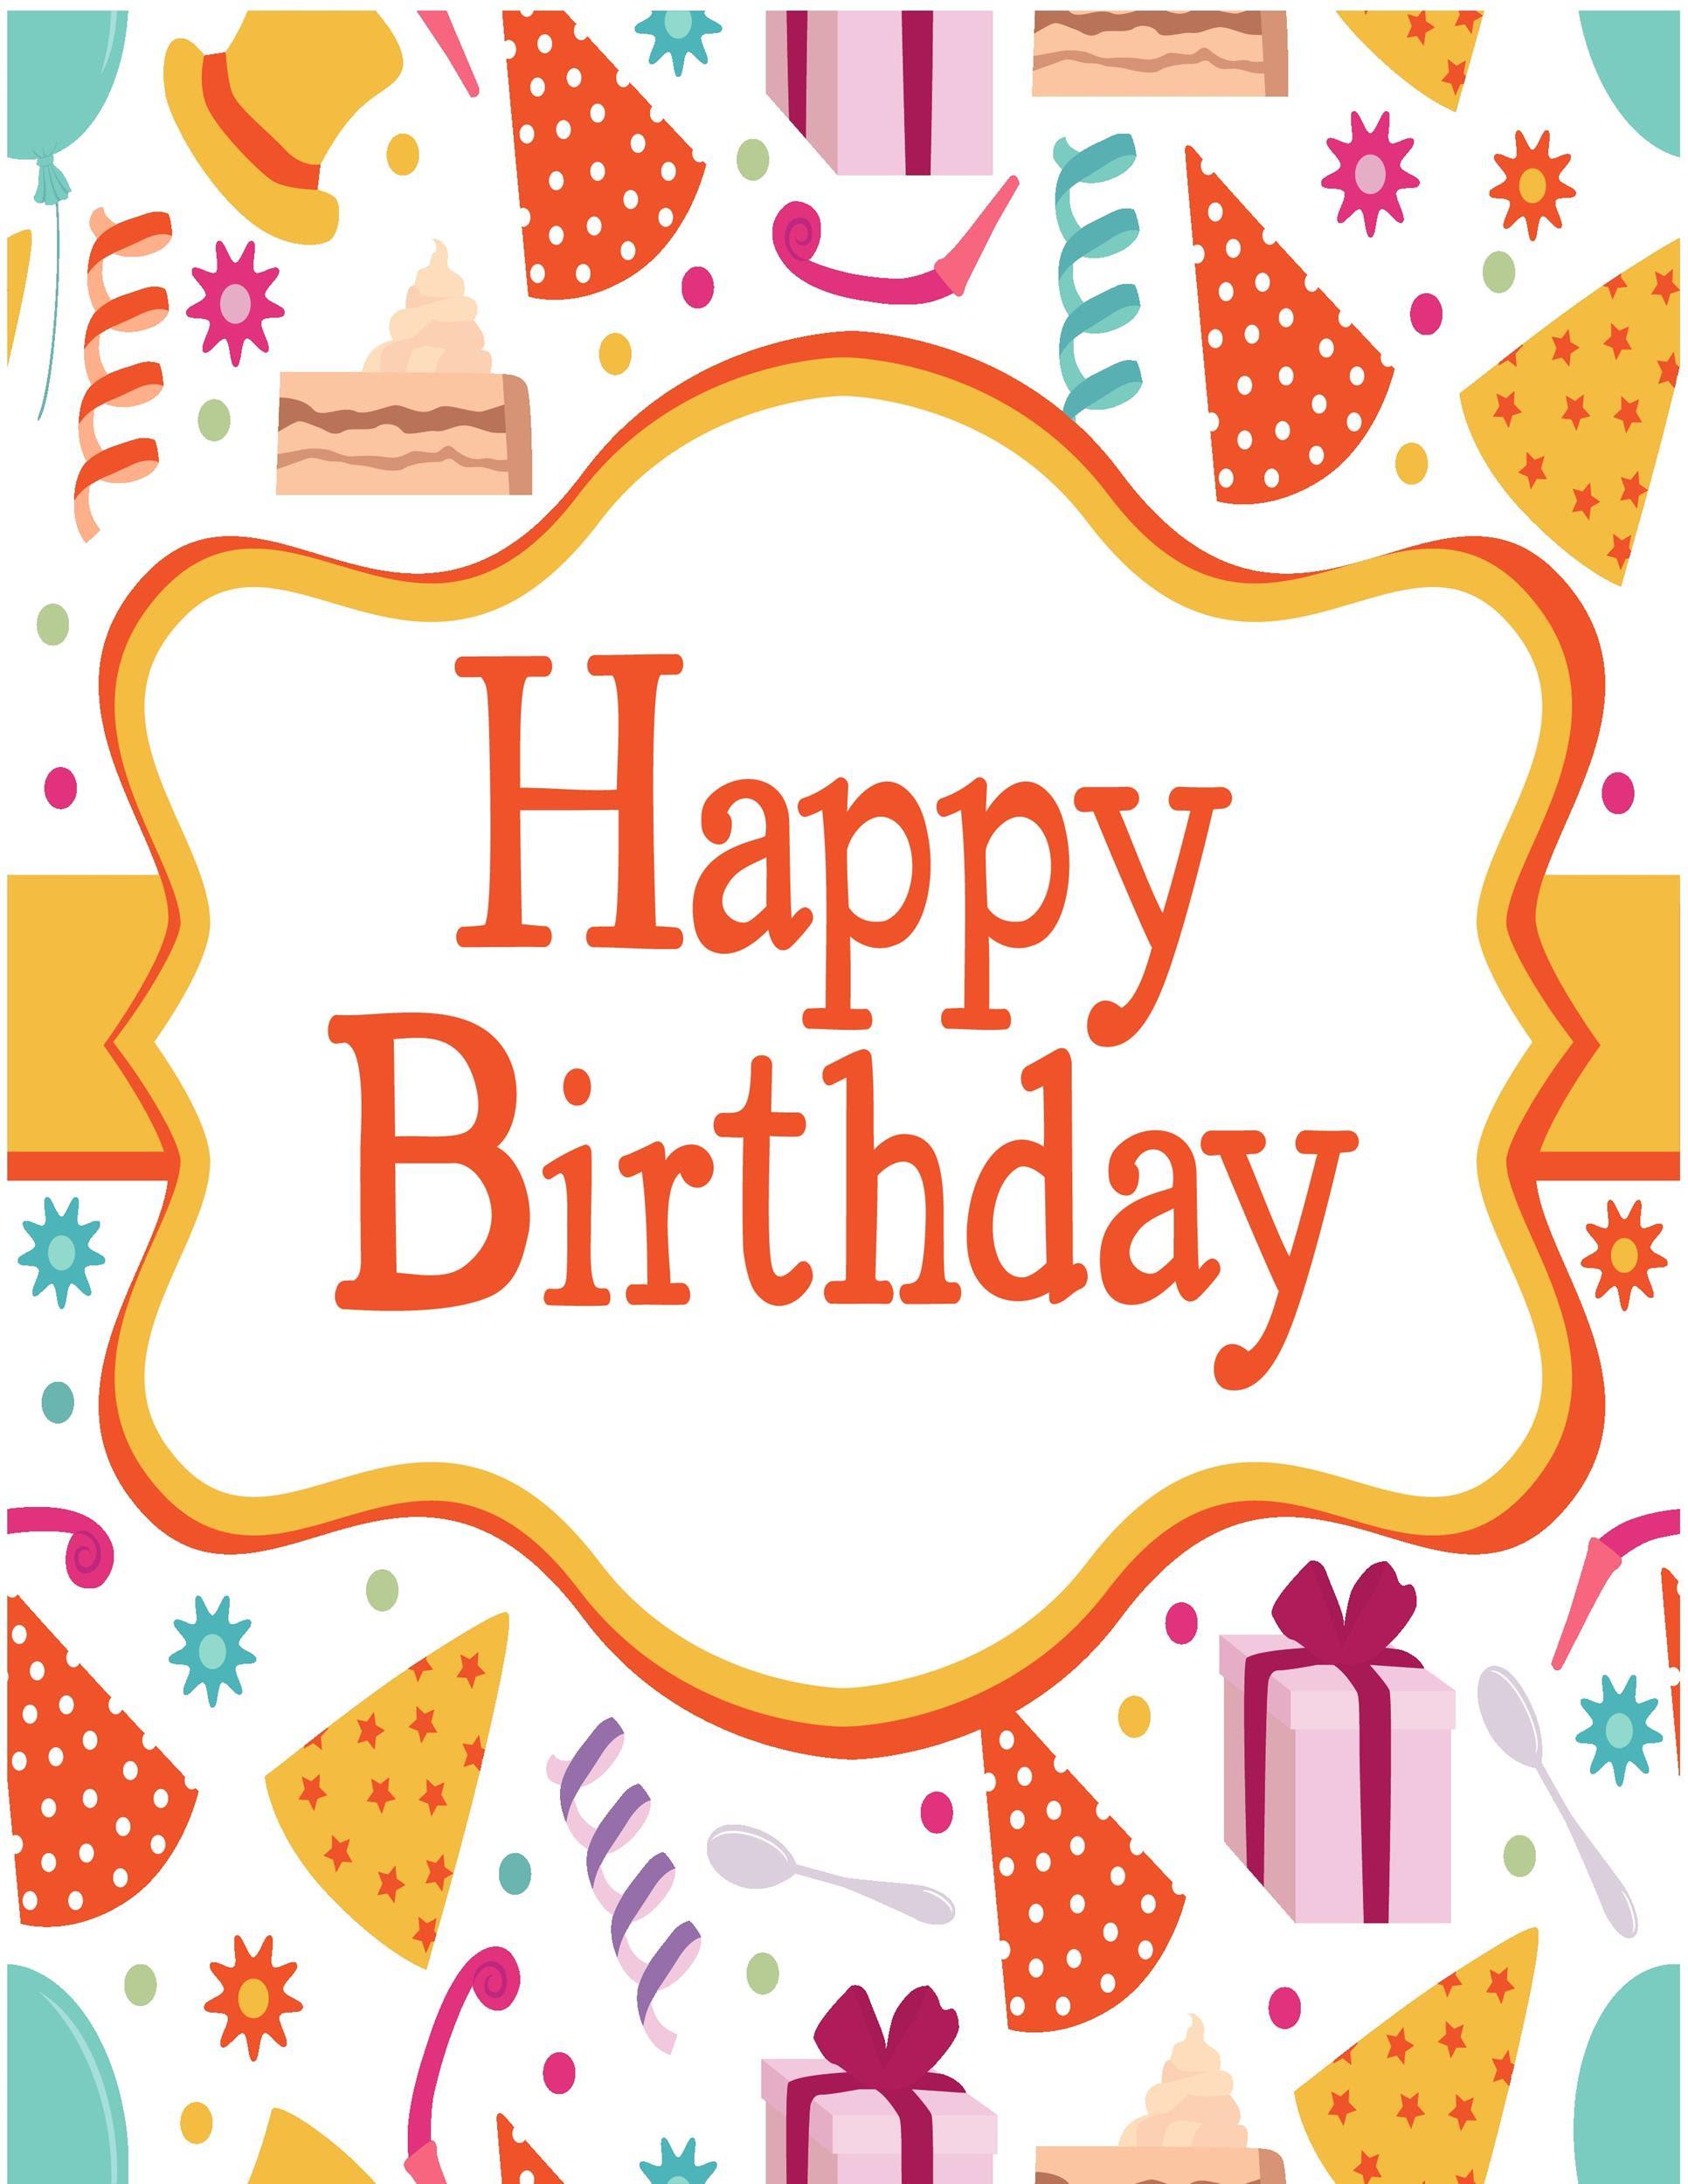 Birthday Card Templates Free Card Design Template